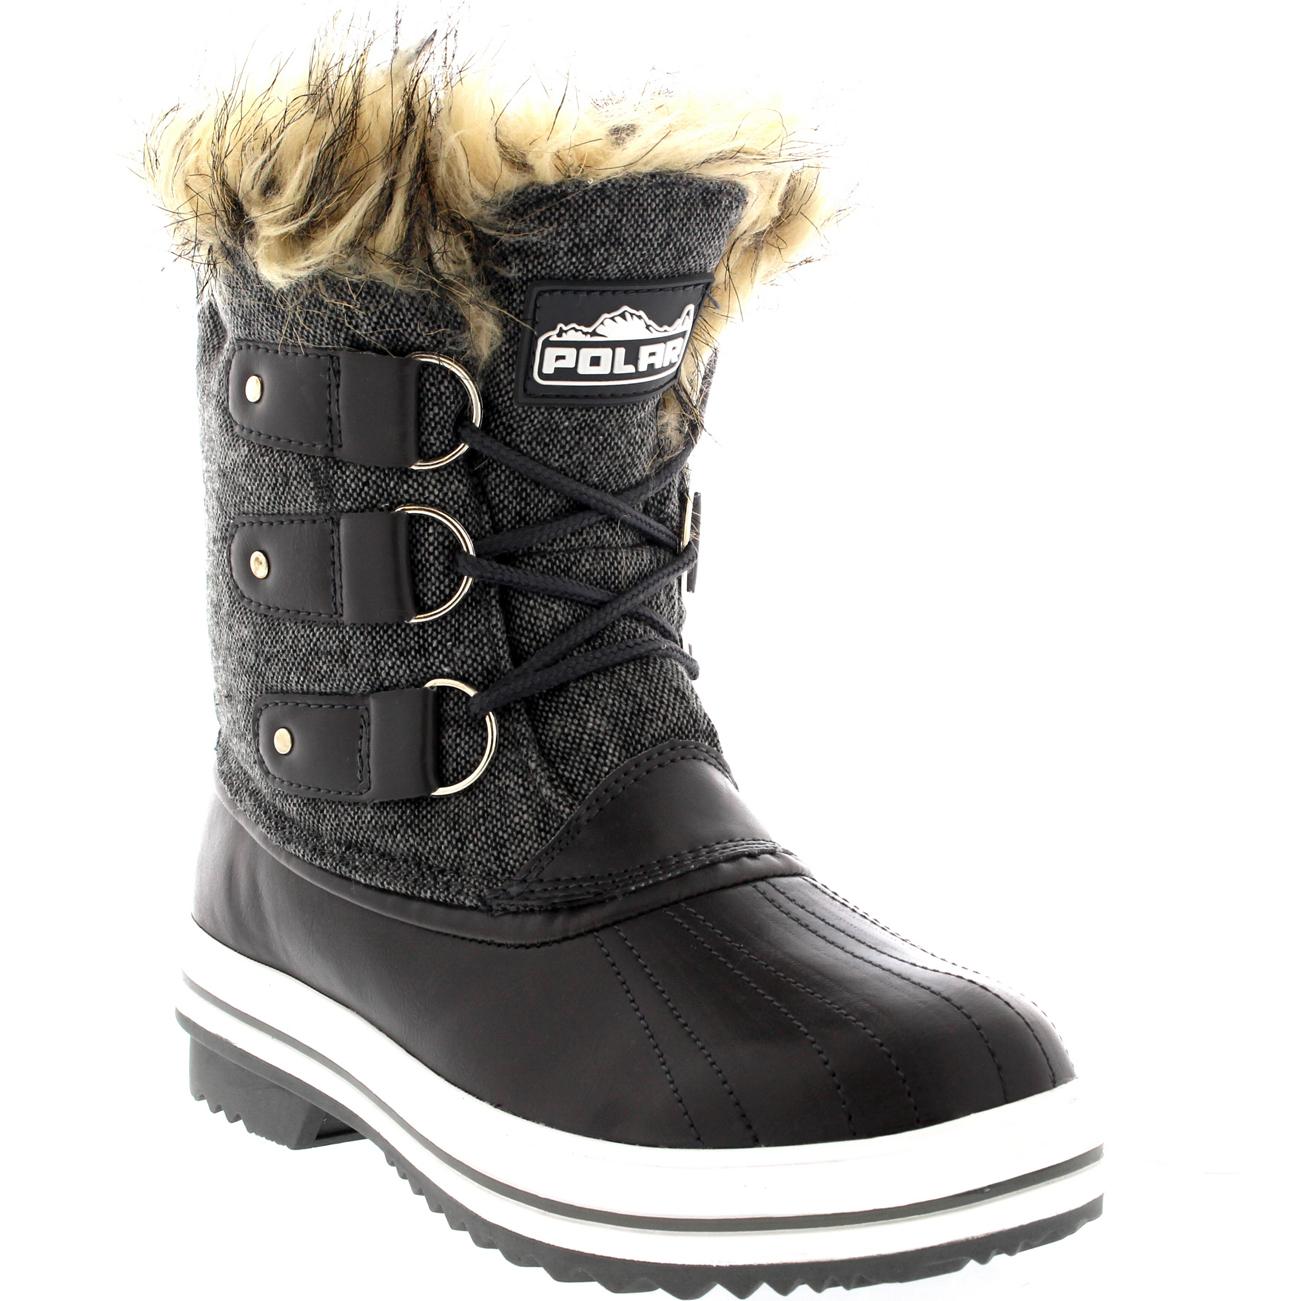 Sears Mens Winter Boot Sale | Homewood Mountain Ski Resort